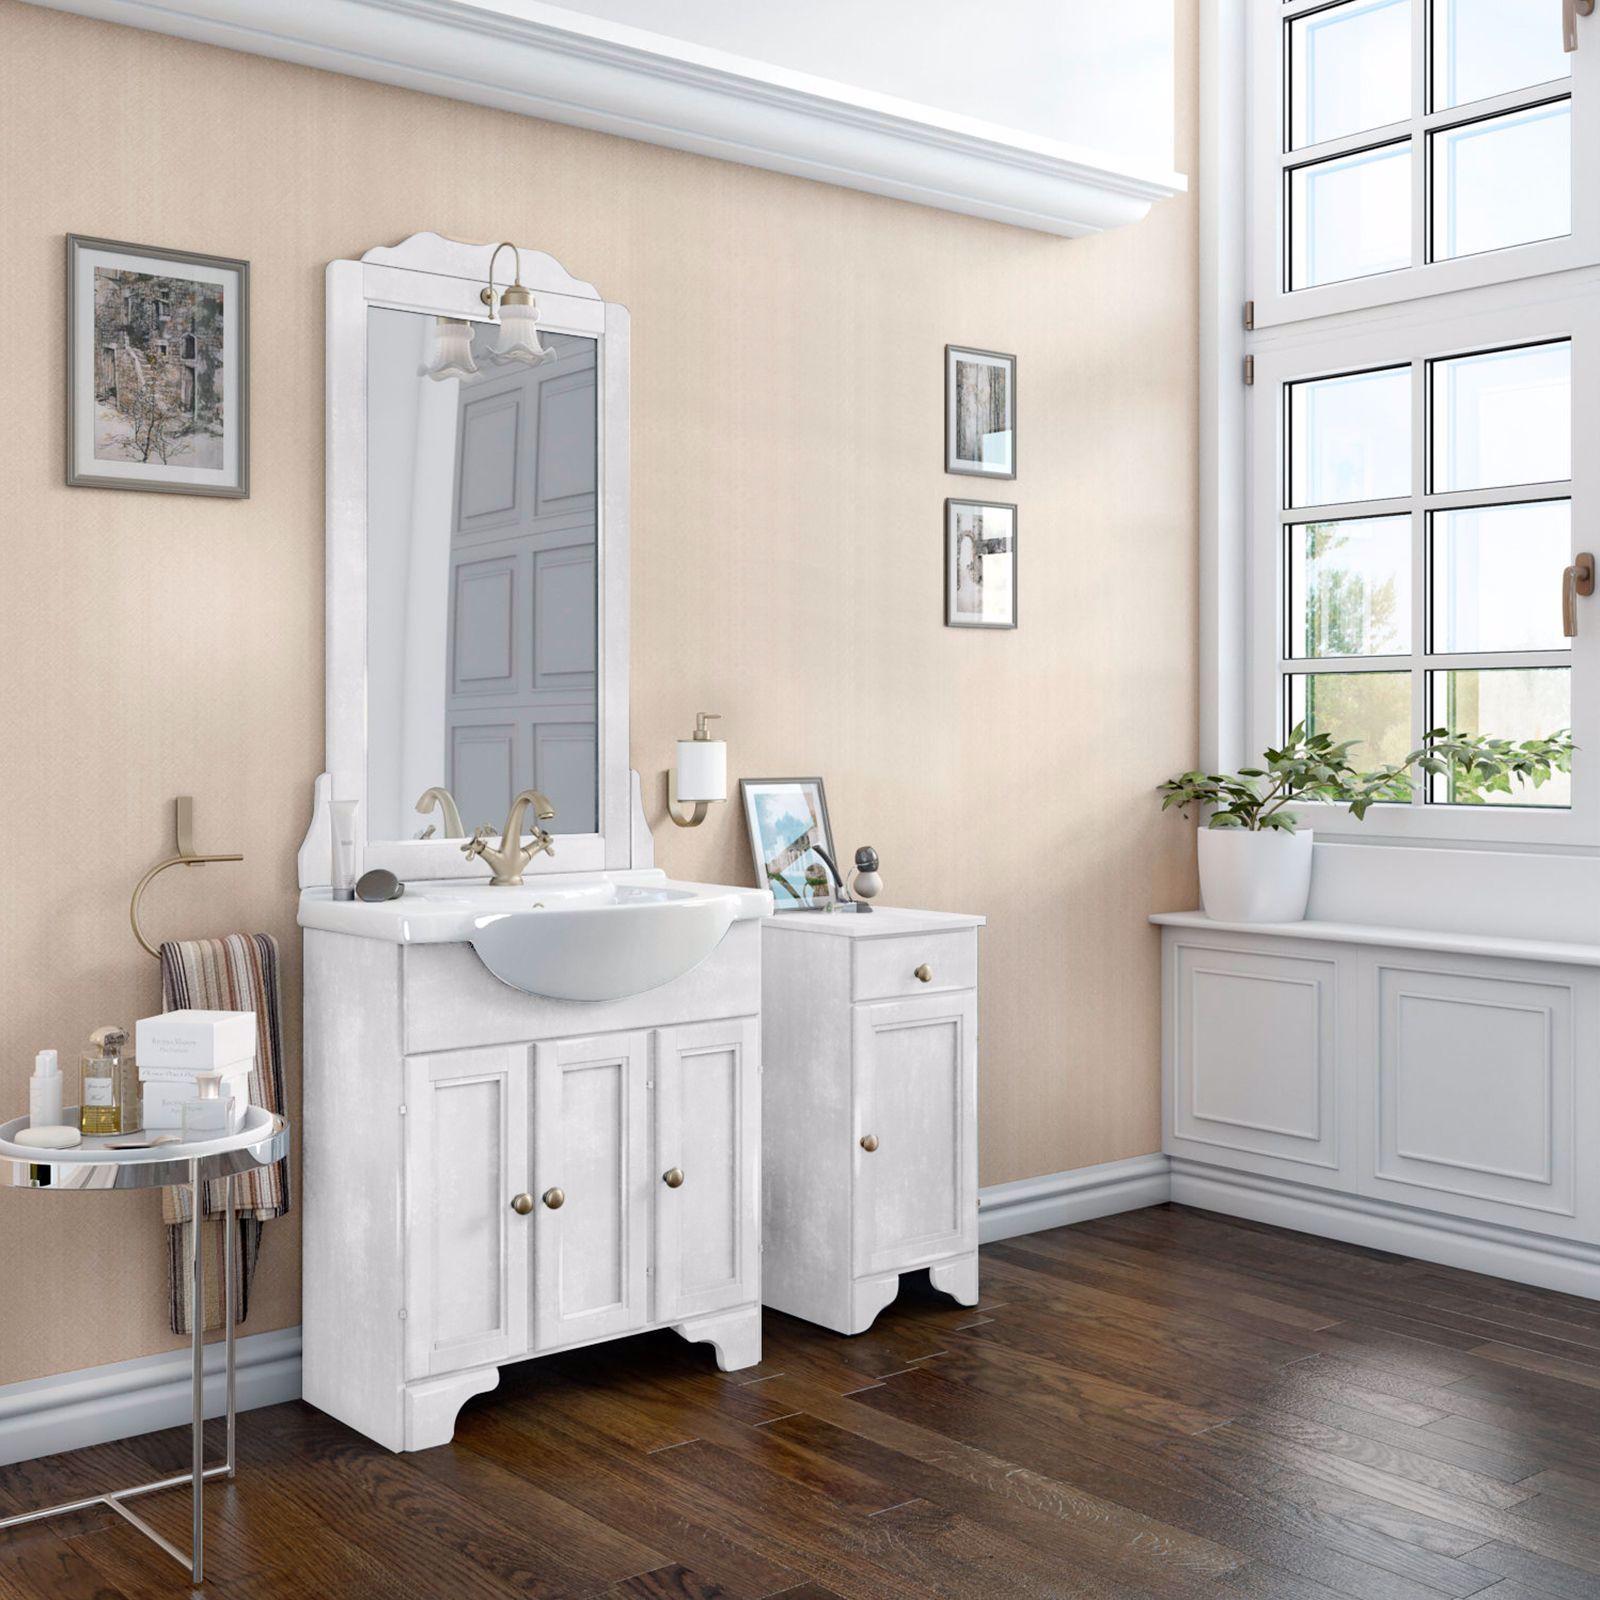 Pittura Shabby Leroy Merlin mobile bianco in legno